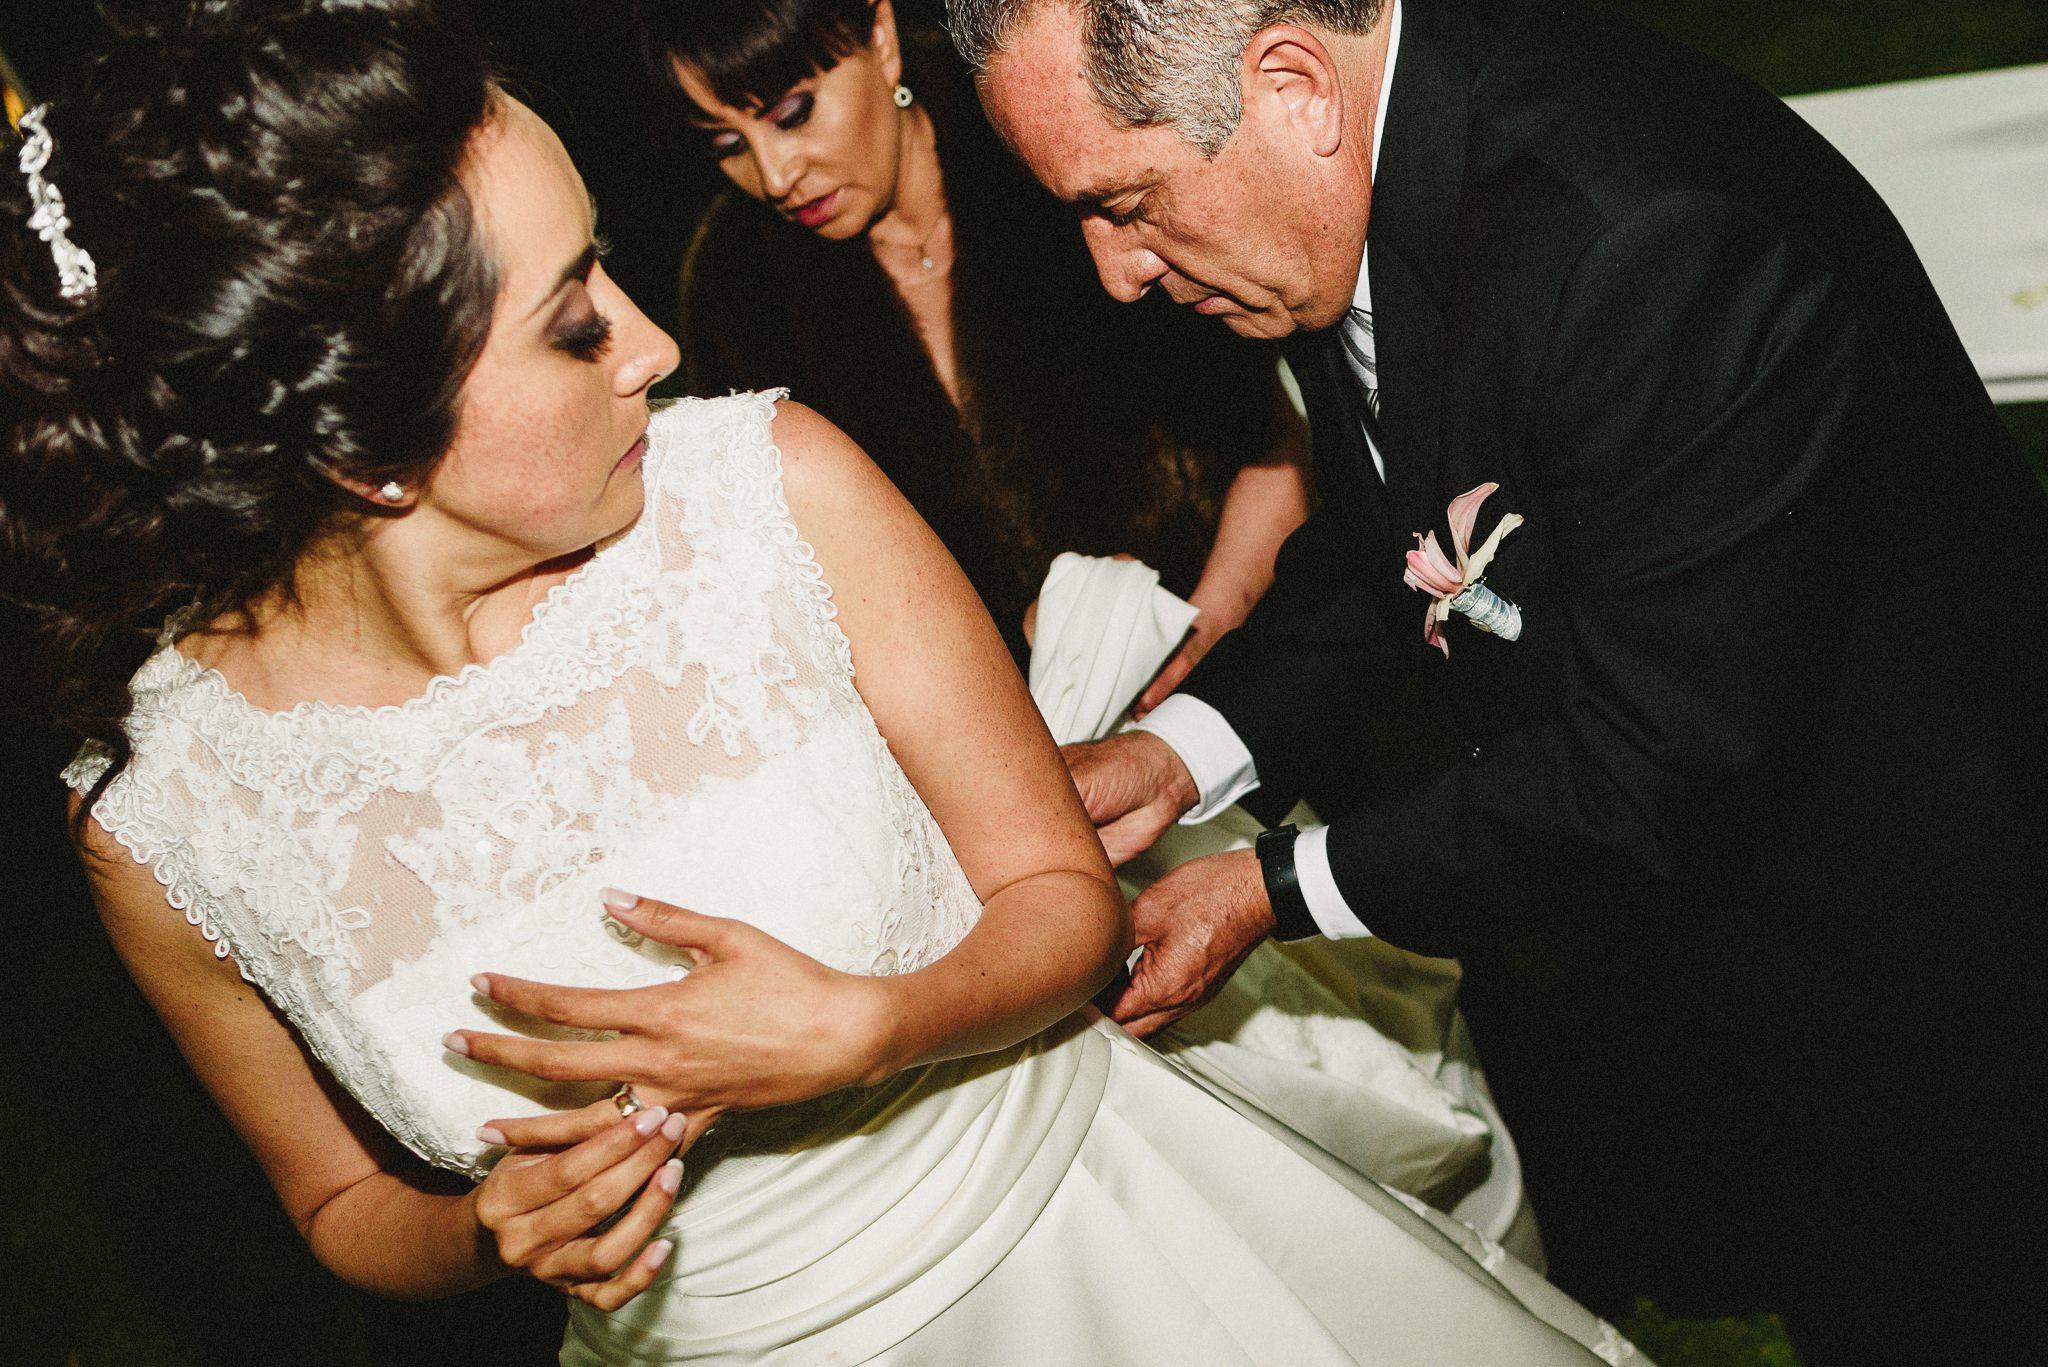 Wedding-Boda-Tulancingo-Hidalgo-Salon-Essenzia-Luis-Houdin-43-film